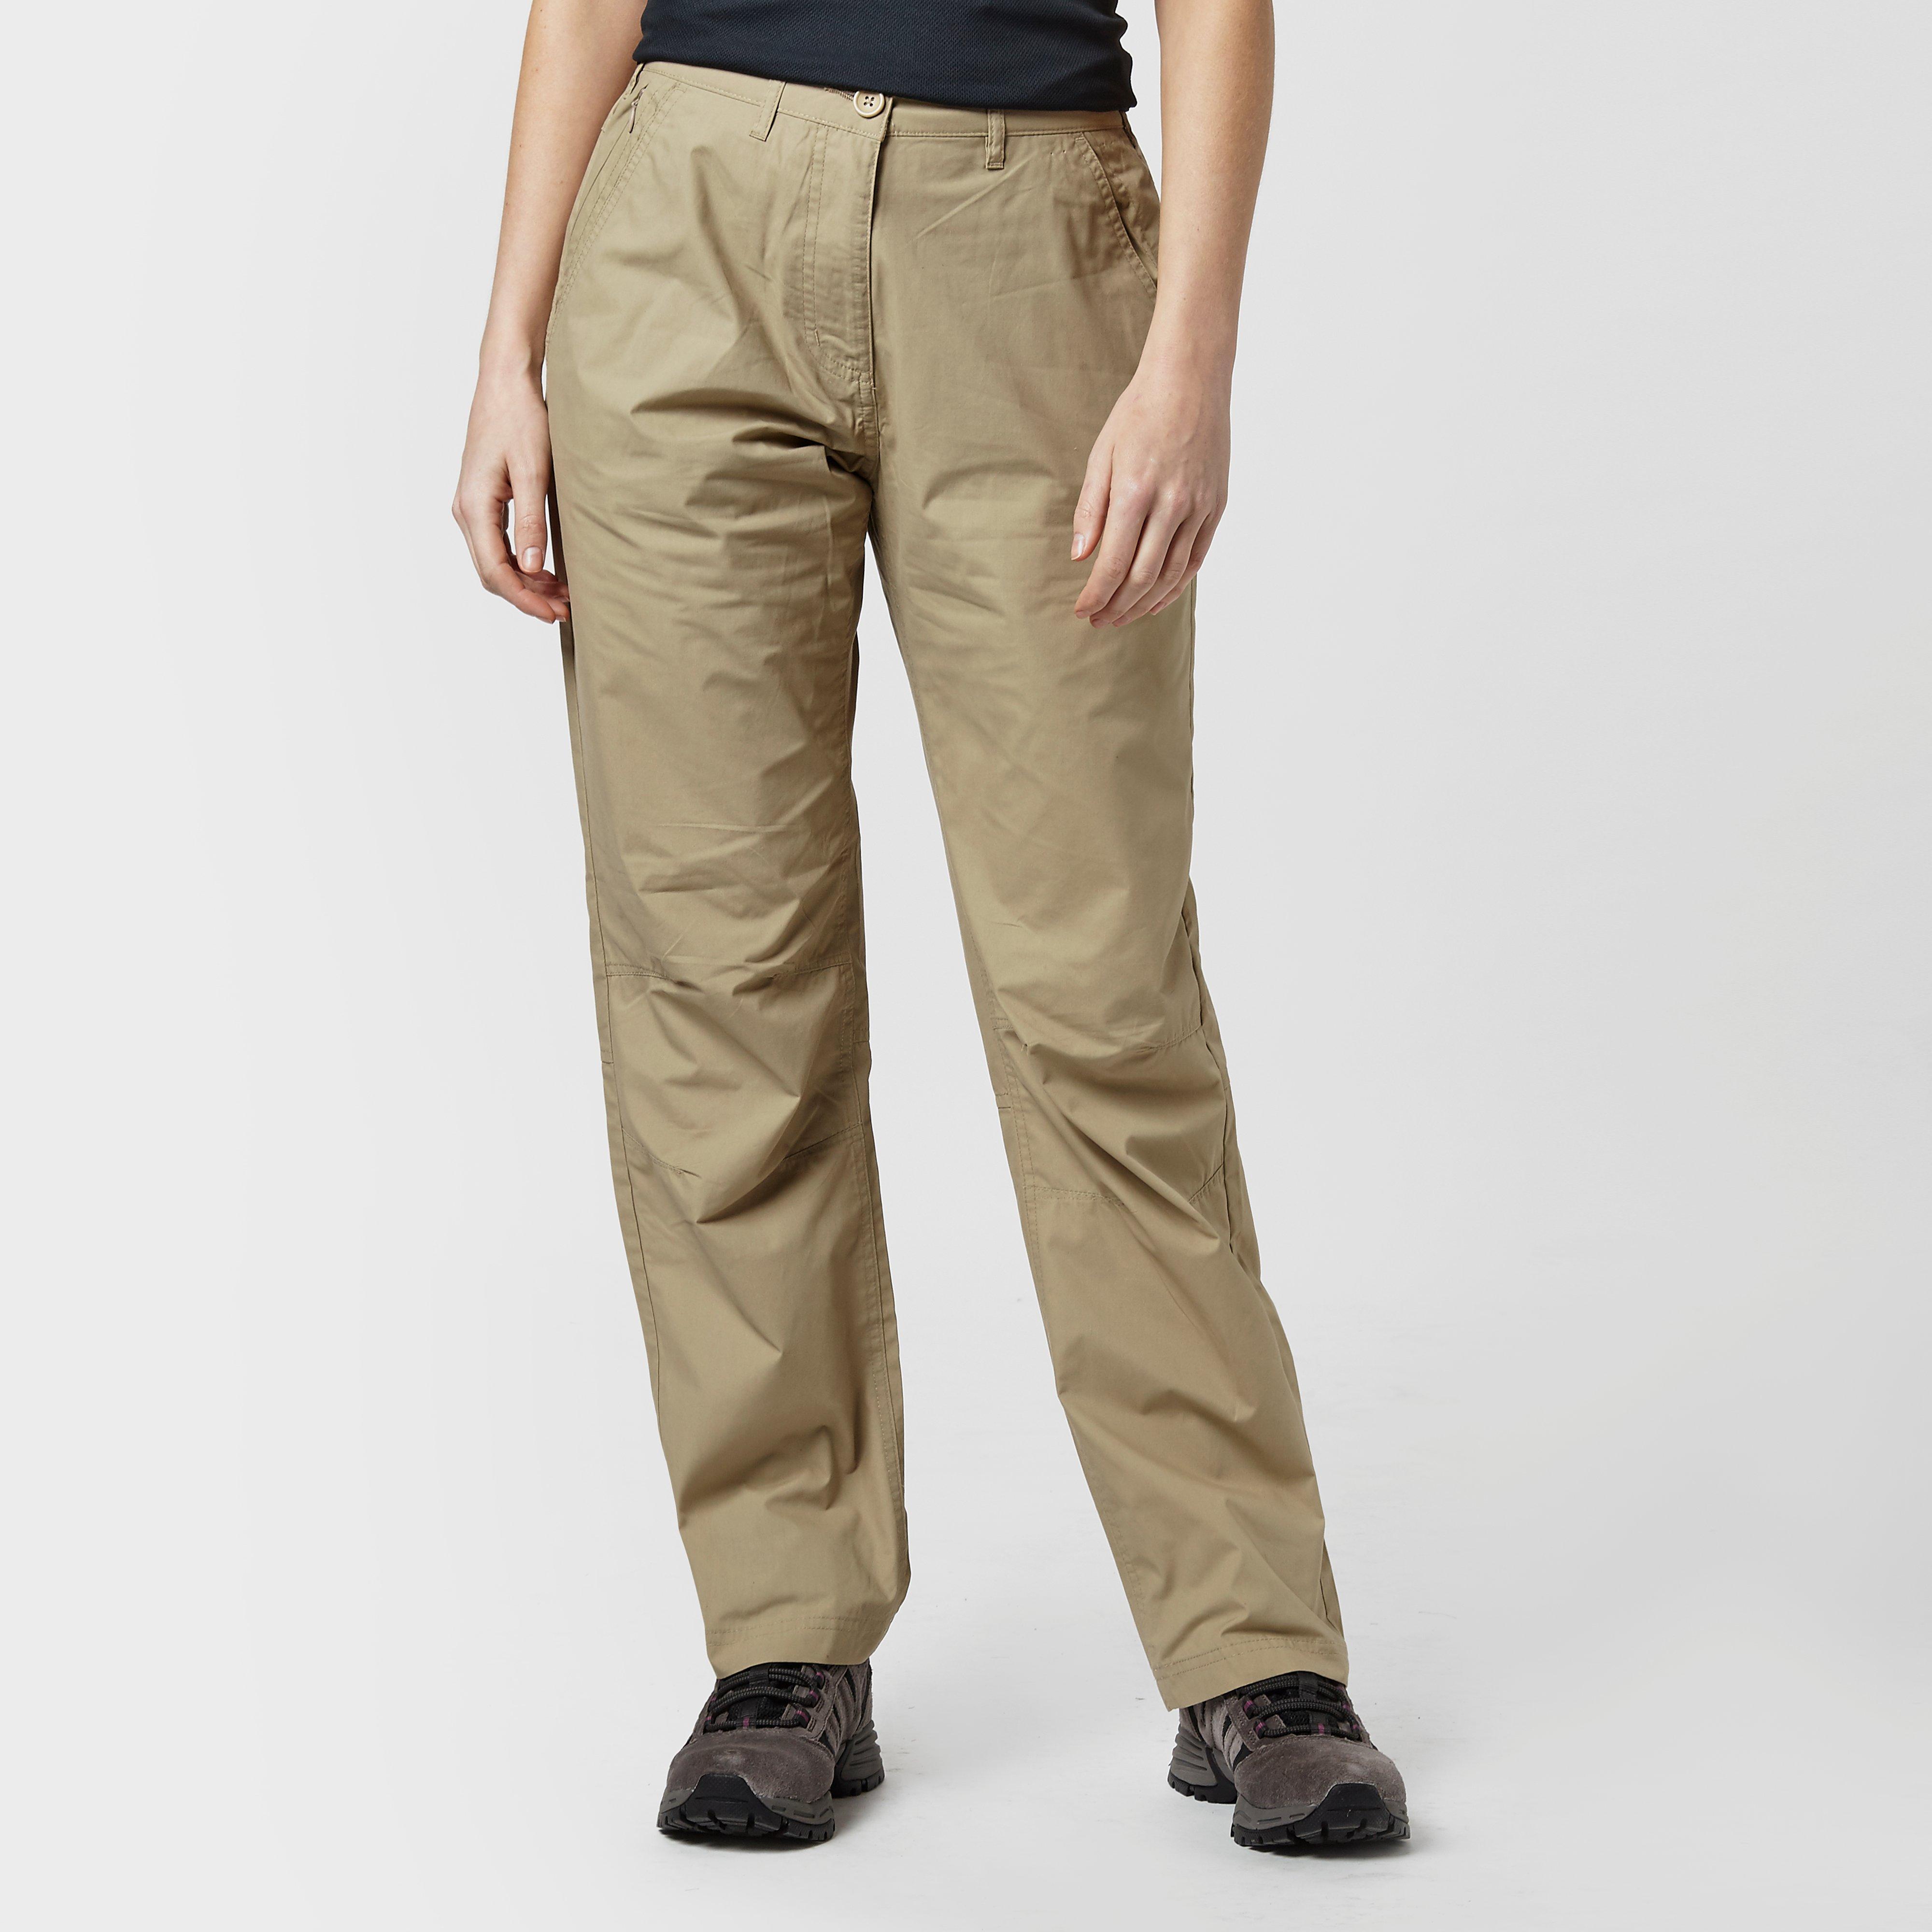 Peter Storm Peter Storm womens Ramble Trousers (Long) - Beige, Beige